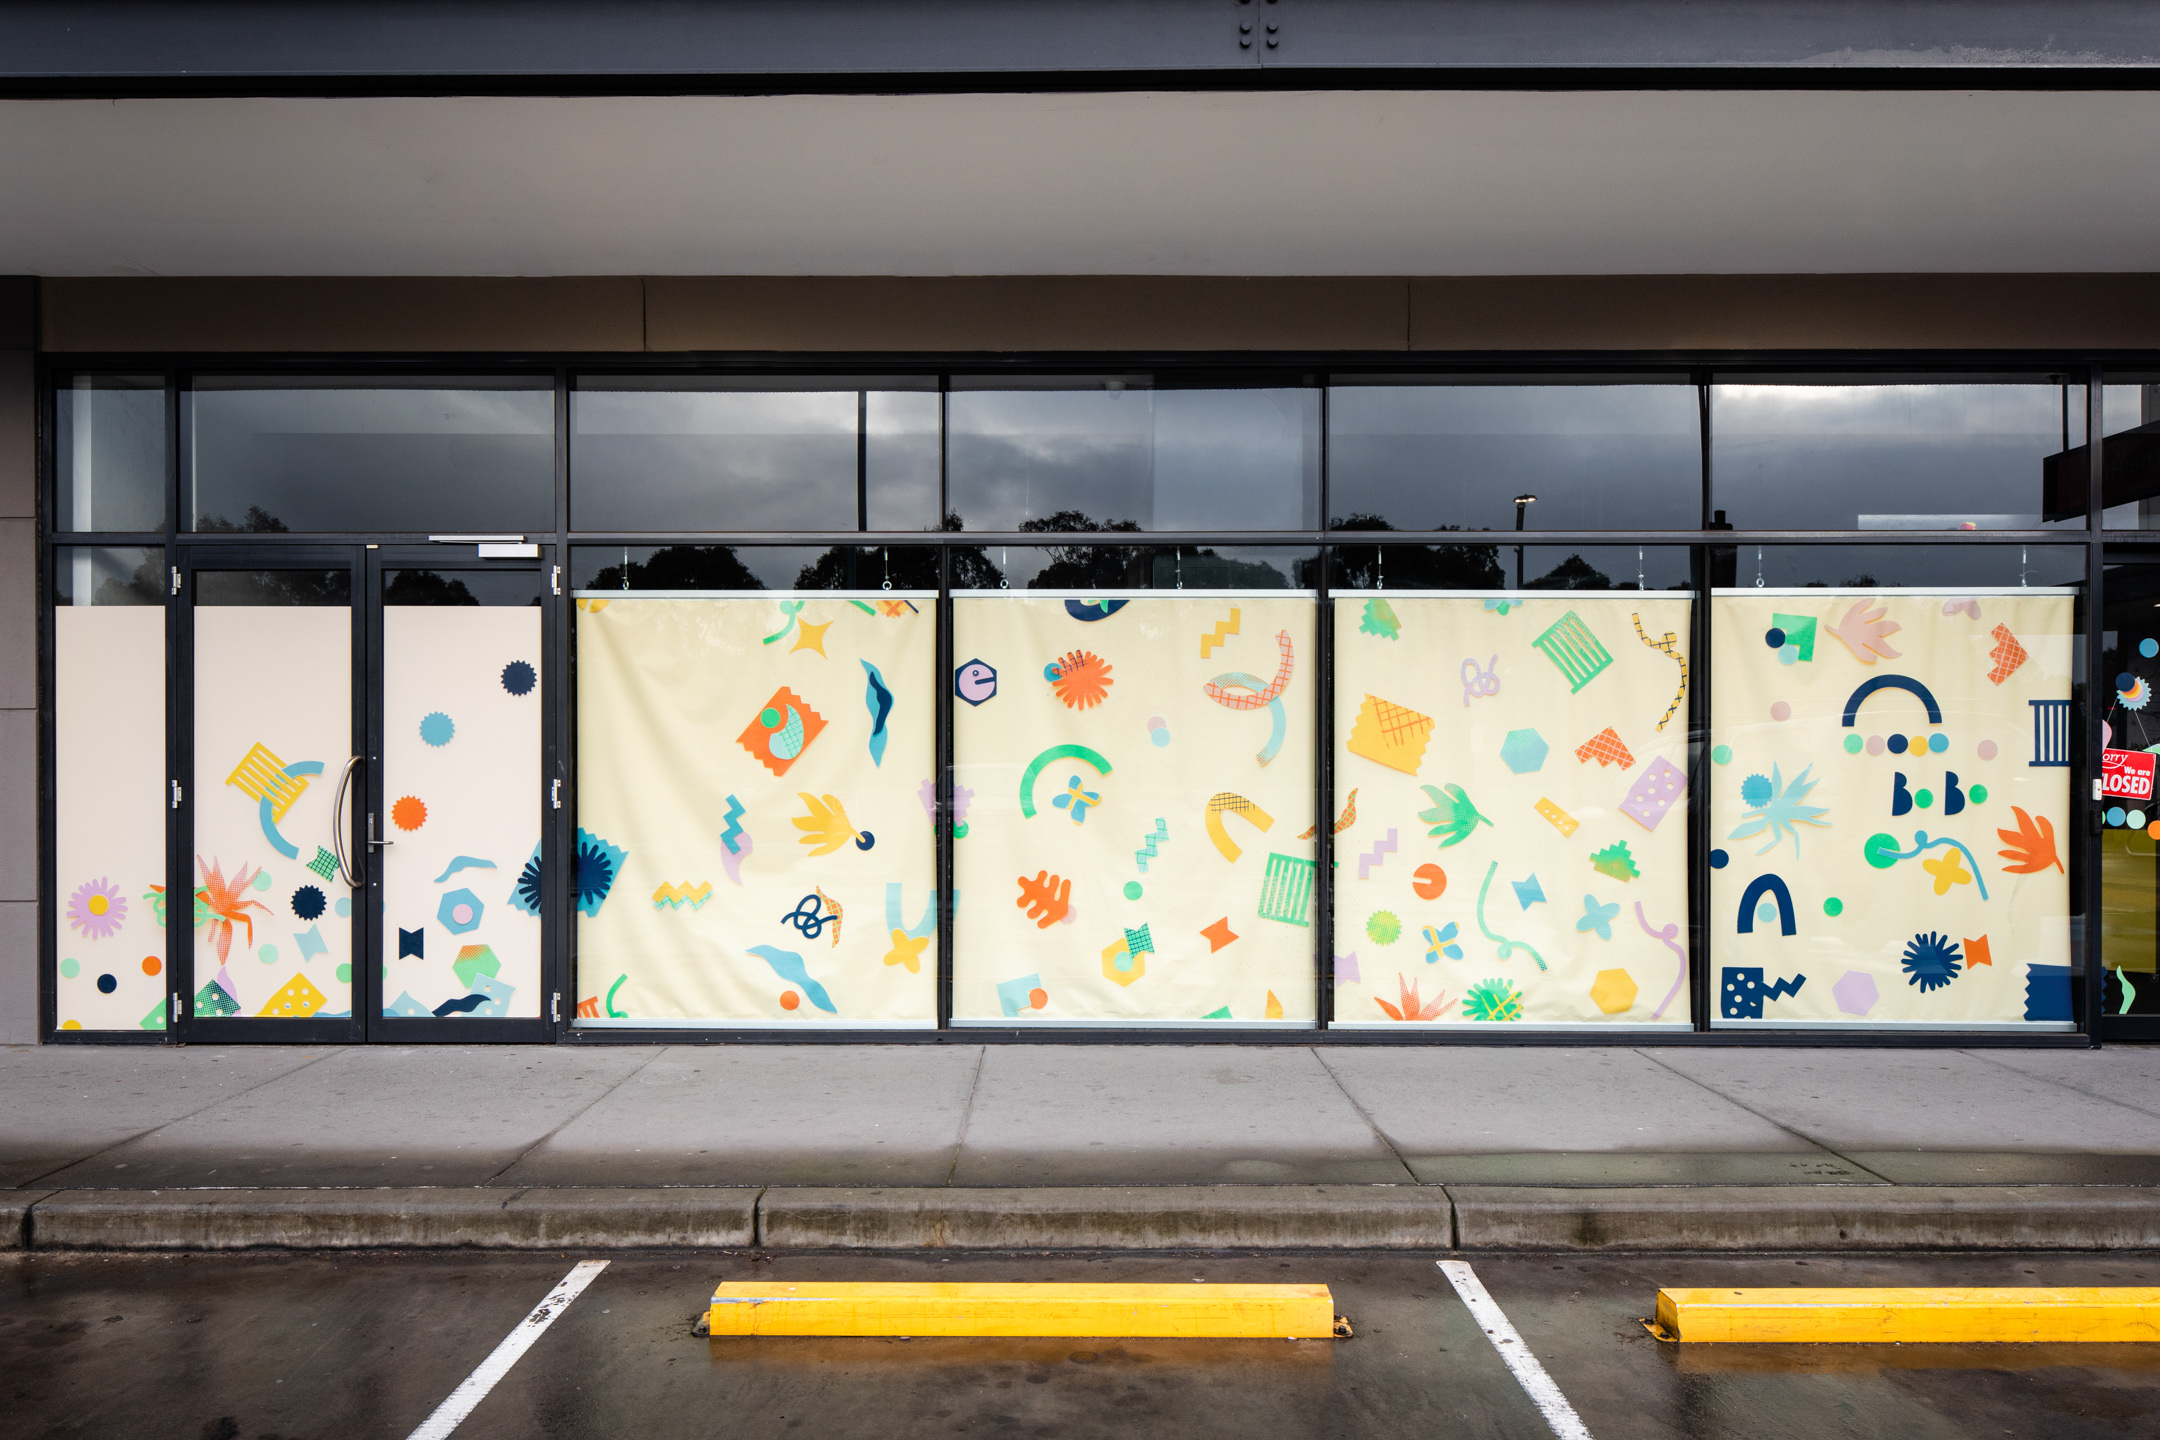 public-journal-the-hub-windows-3